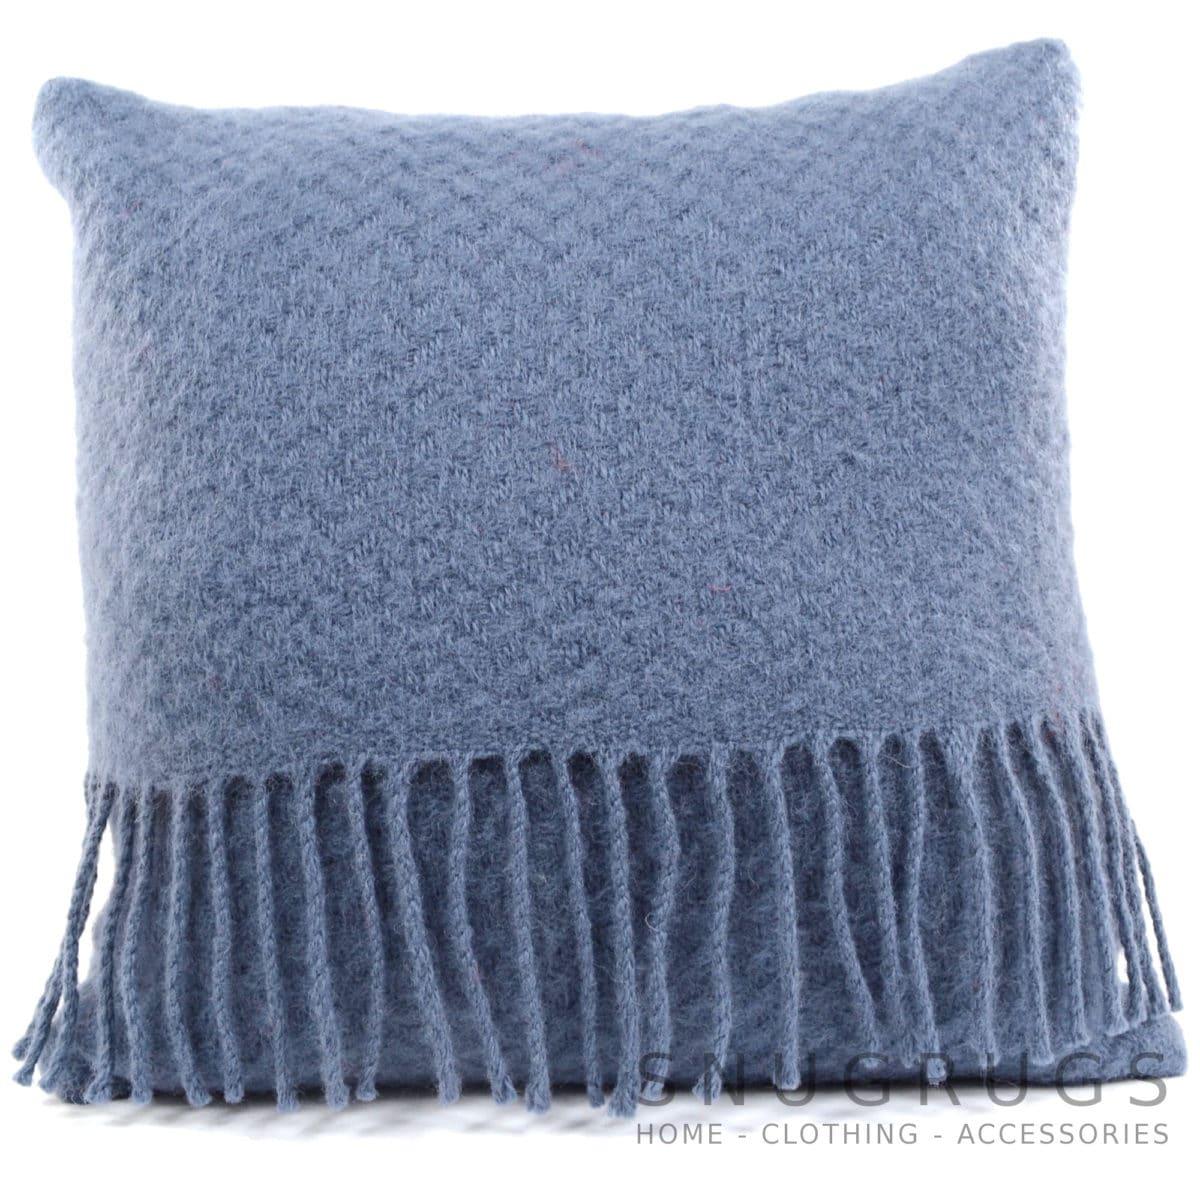 Wafer Wool Cushion - Blueberry